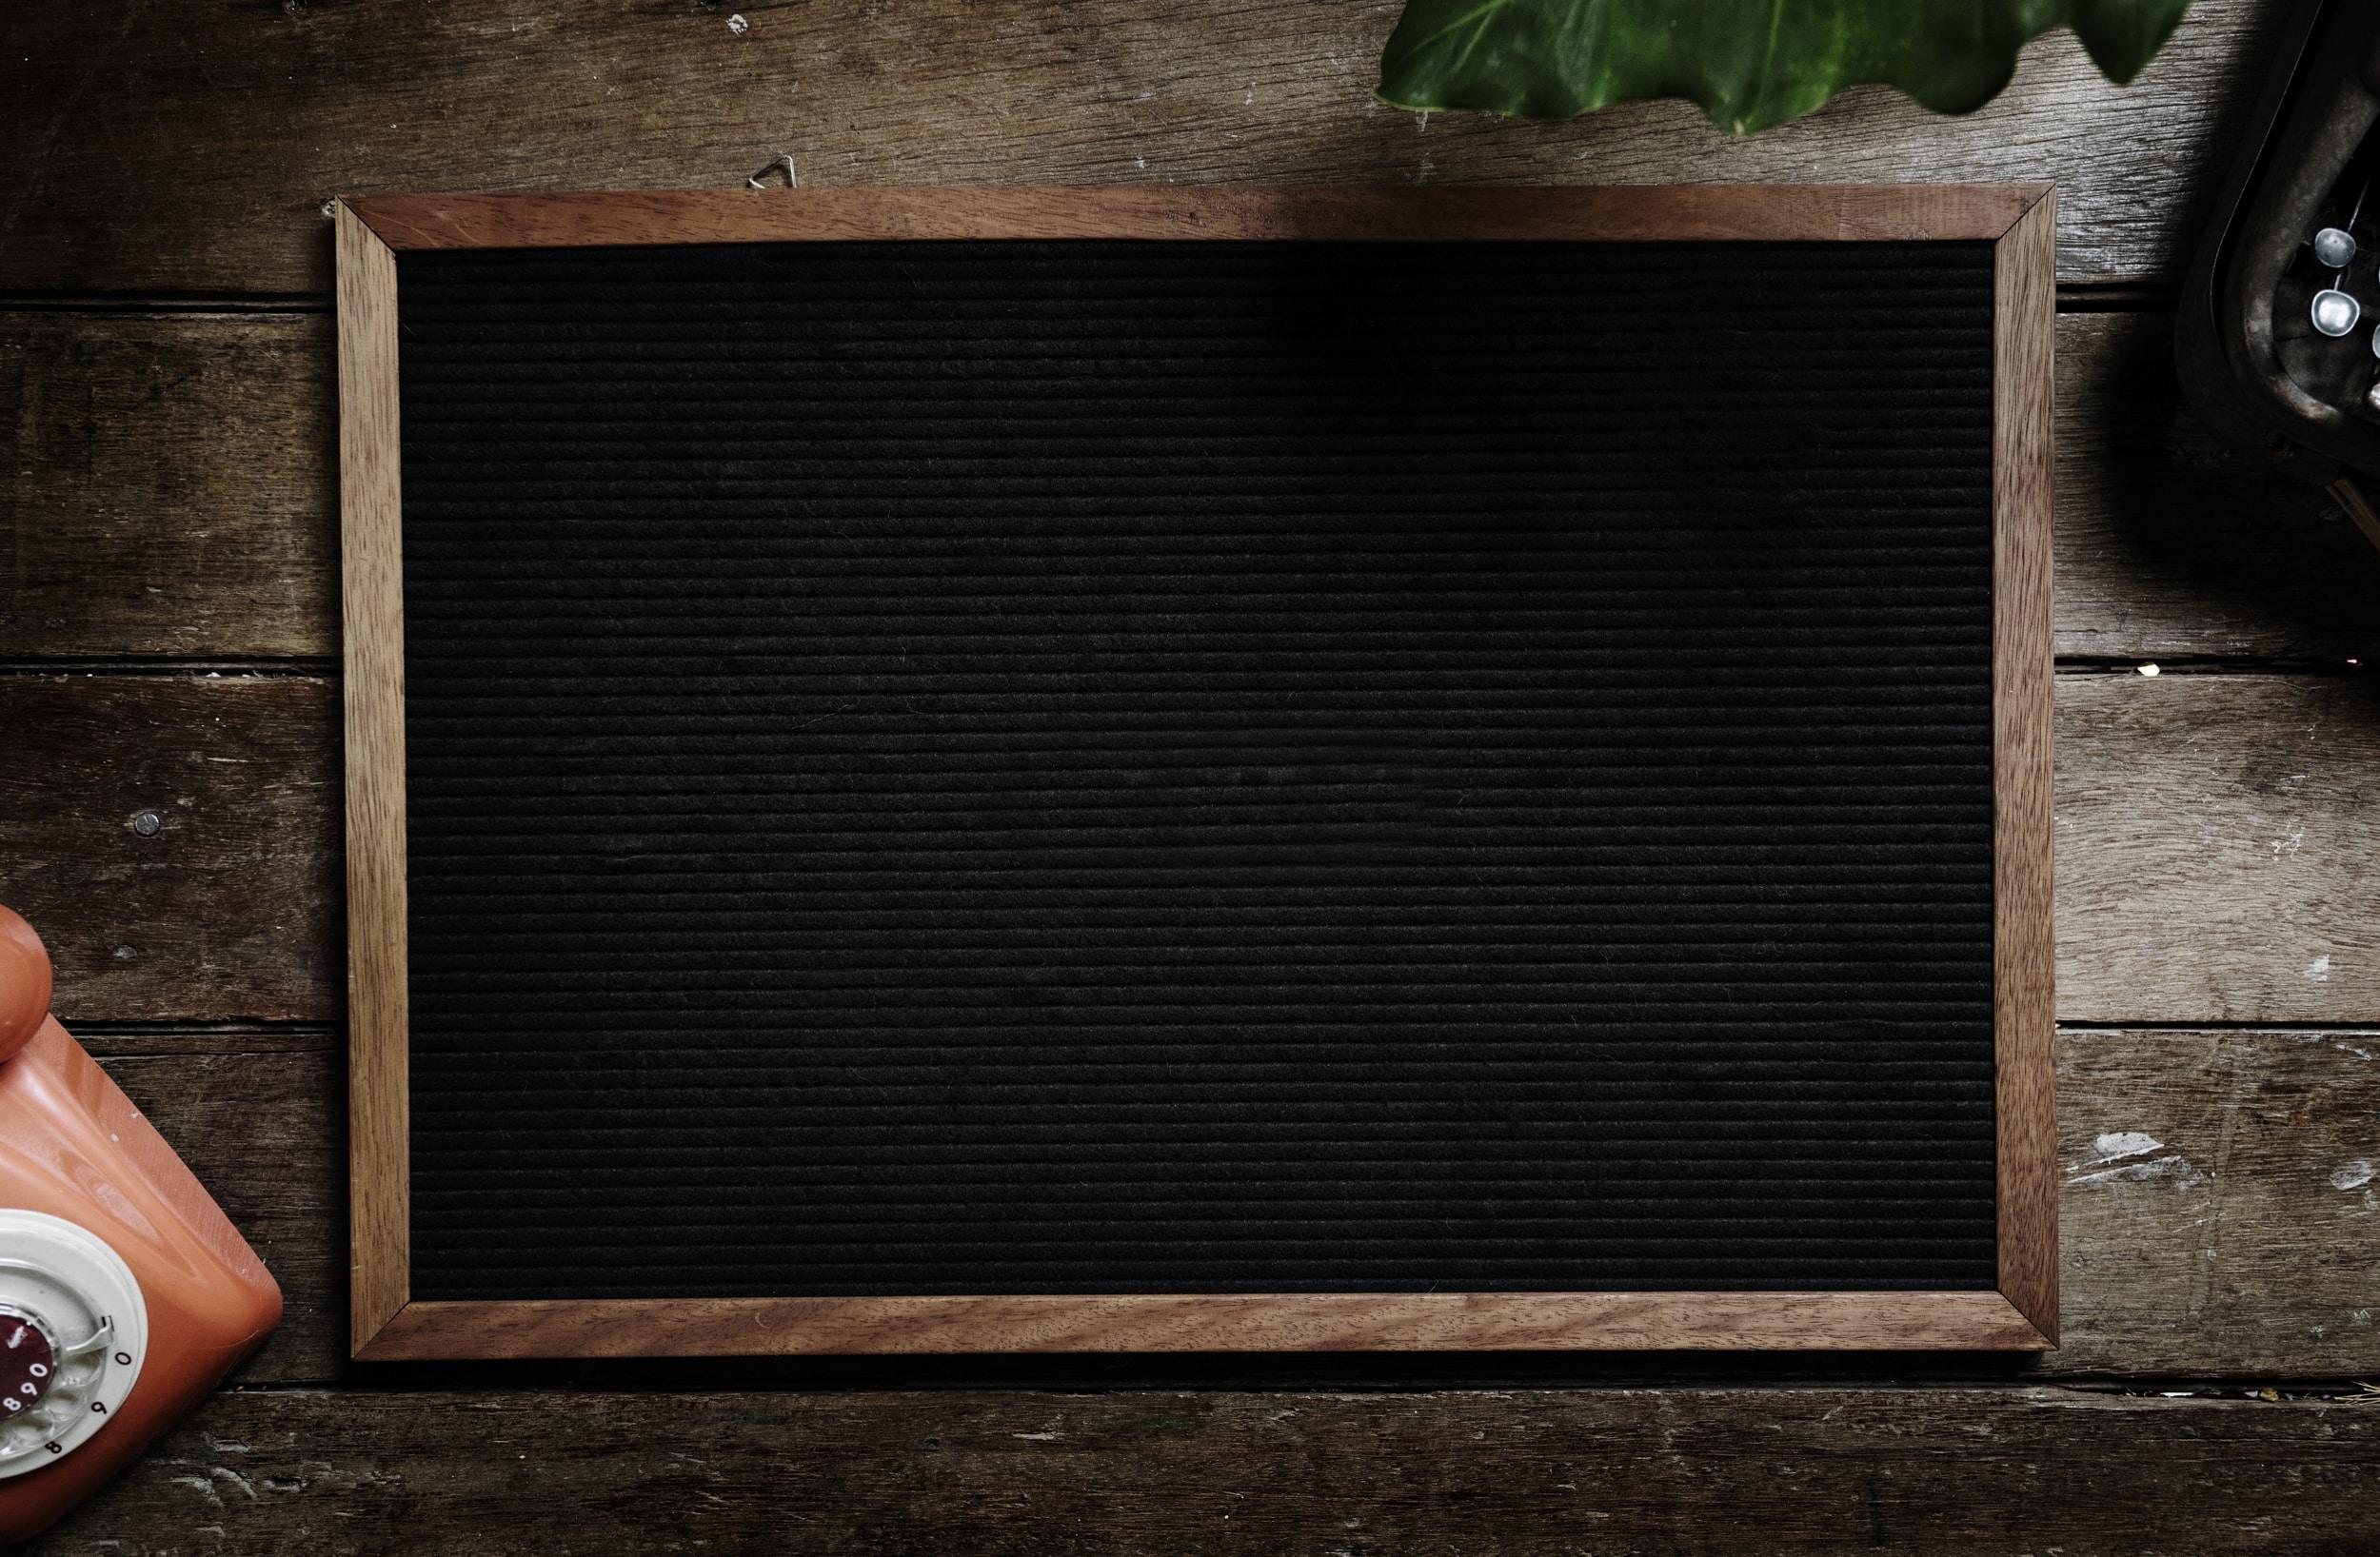 rectangular black board on brown wooden surface